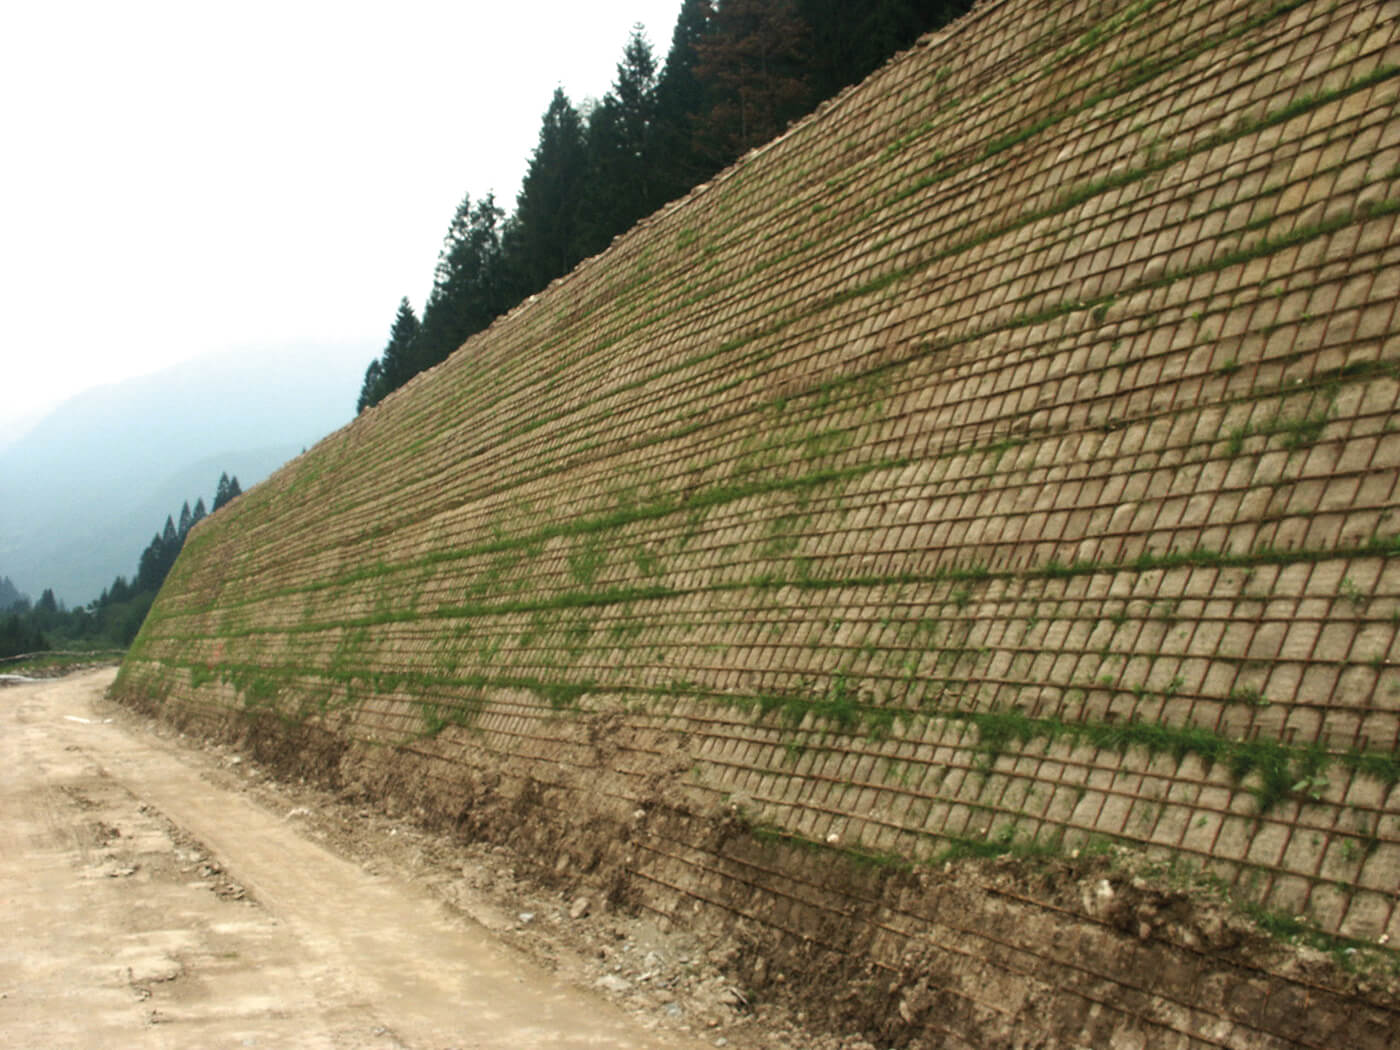 barriera paramassi in terra rinforzata s p 56 edilfloor